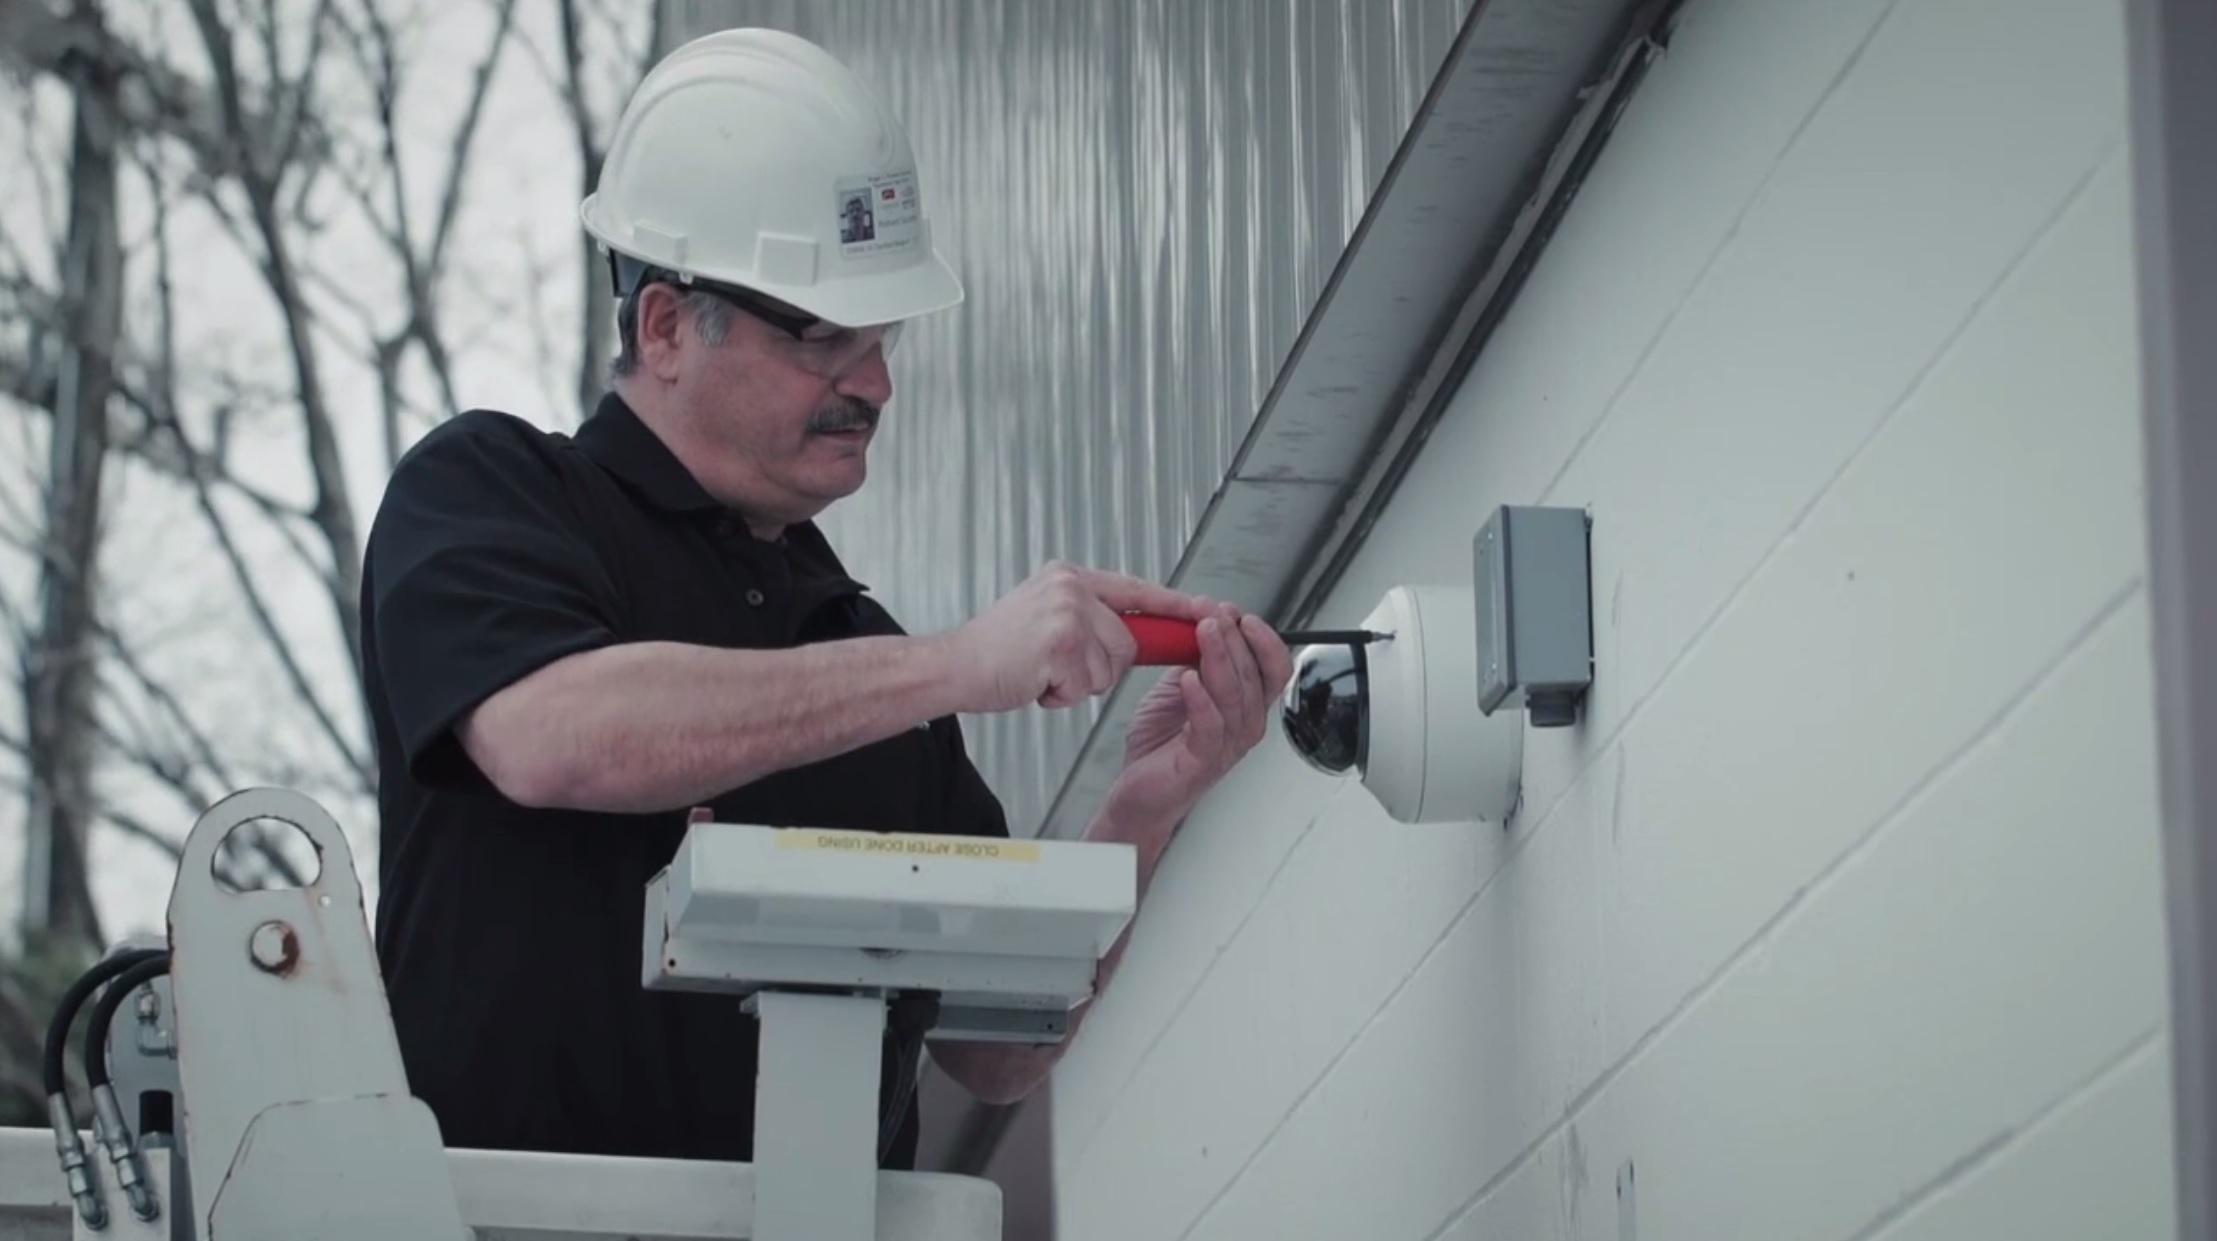 alarm-new-england-business-outdoor-camera-installation